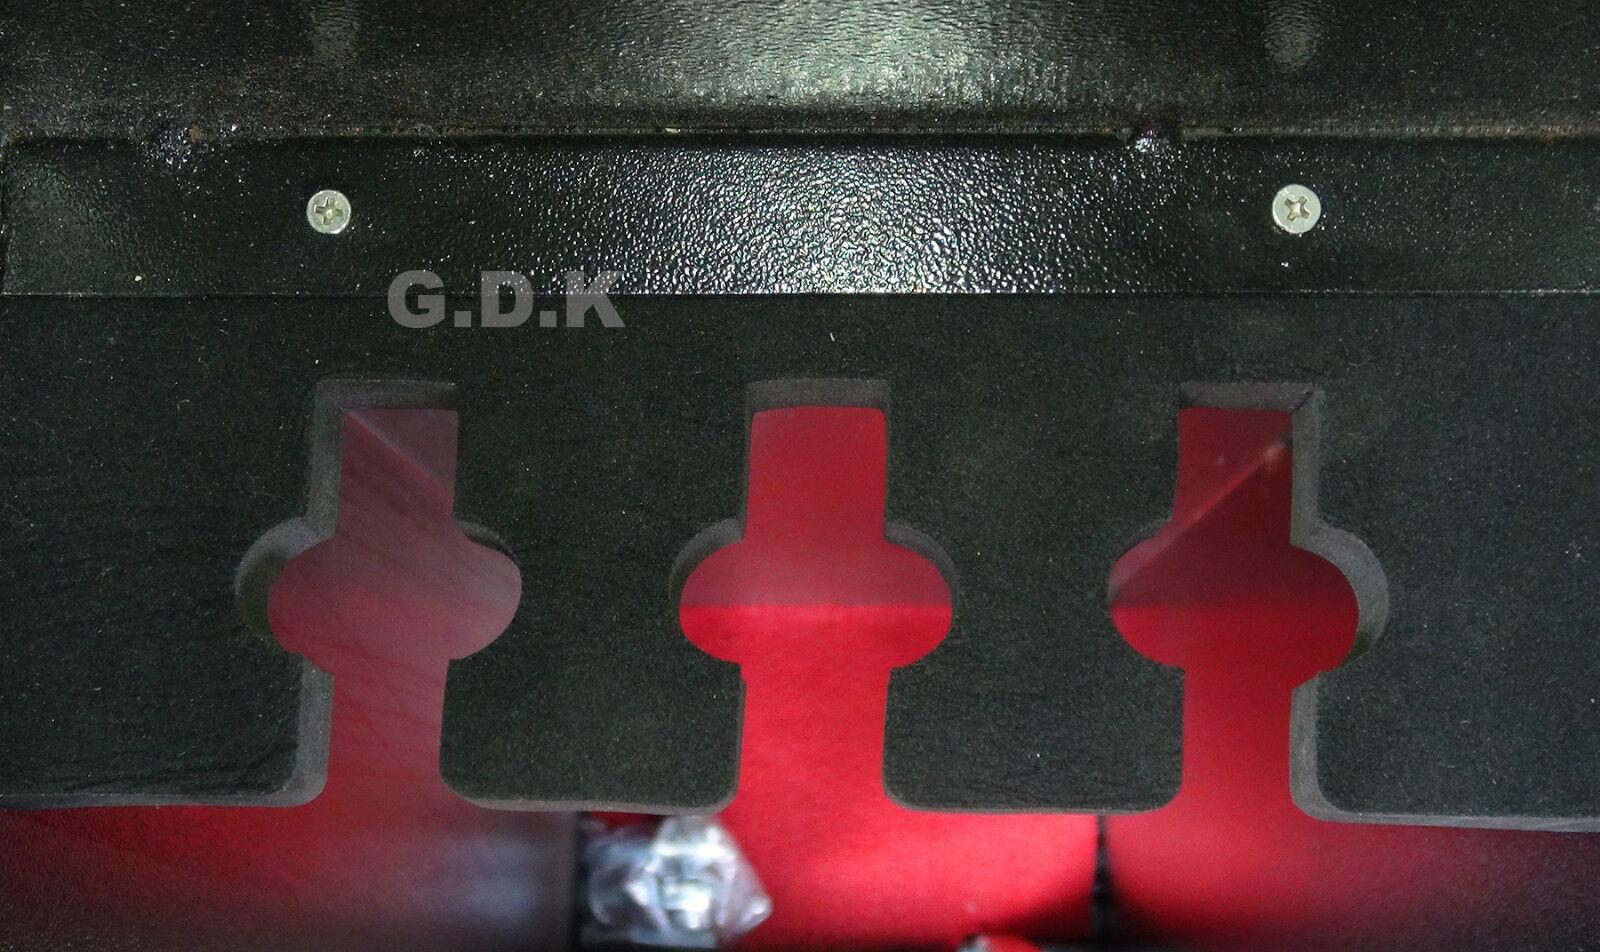 CHOICE OF 3 GUN CABINET CABINET CABINET MODELS, SHOTGUN,RIFLE SAFE, X-TALL, WOOD EFFECT,DIGITAL e0bcee